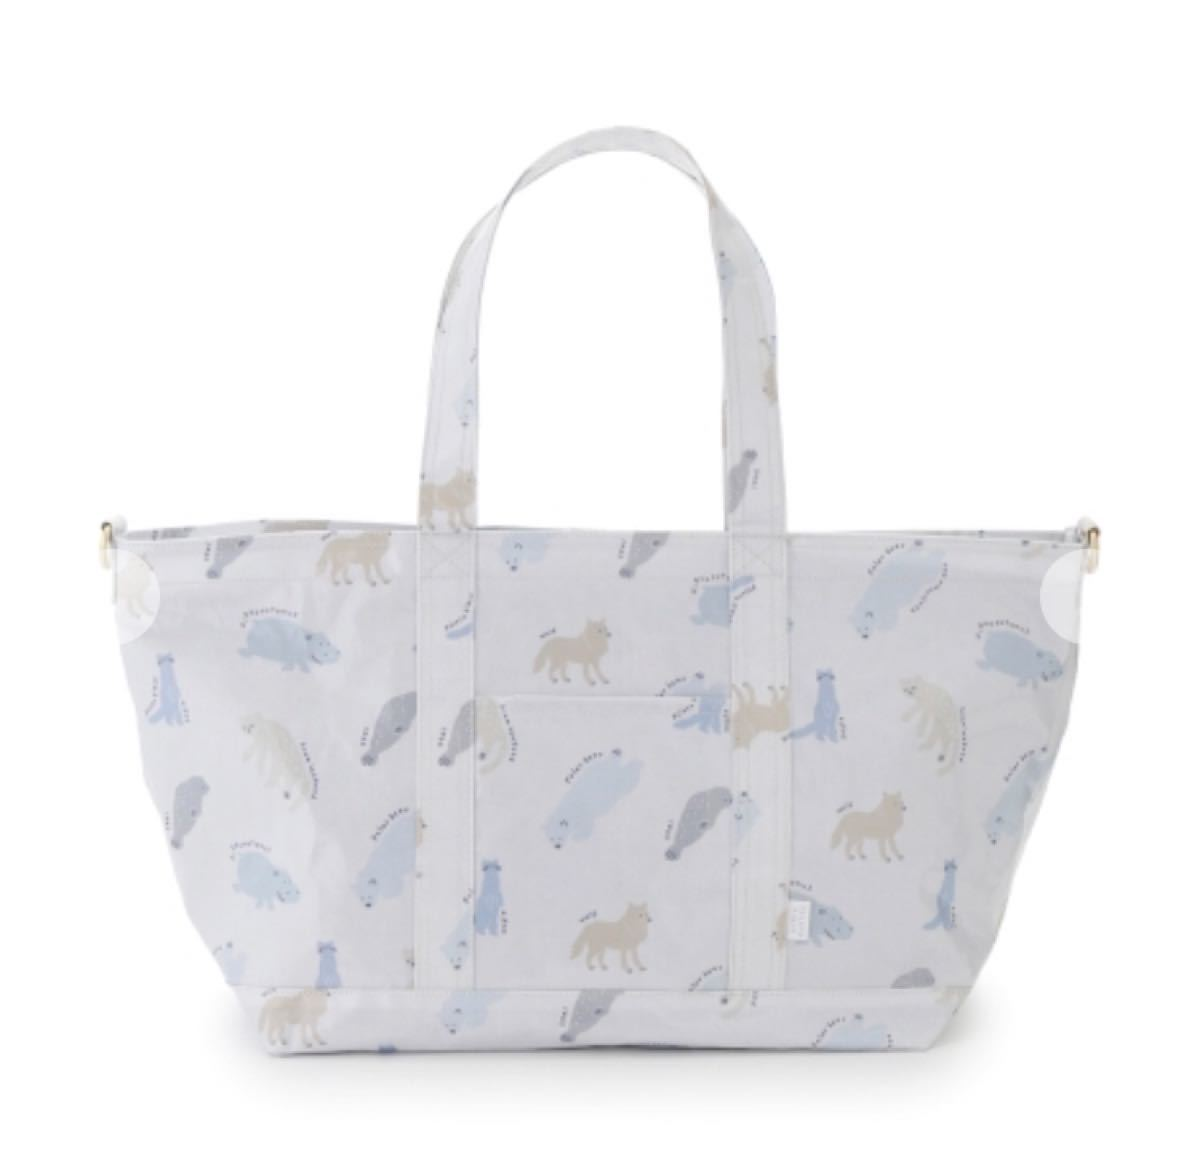 gelato pique【旭山動物園】ペイントアニマルママバッグ マザーズバッグ トートバッグ